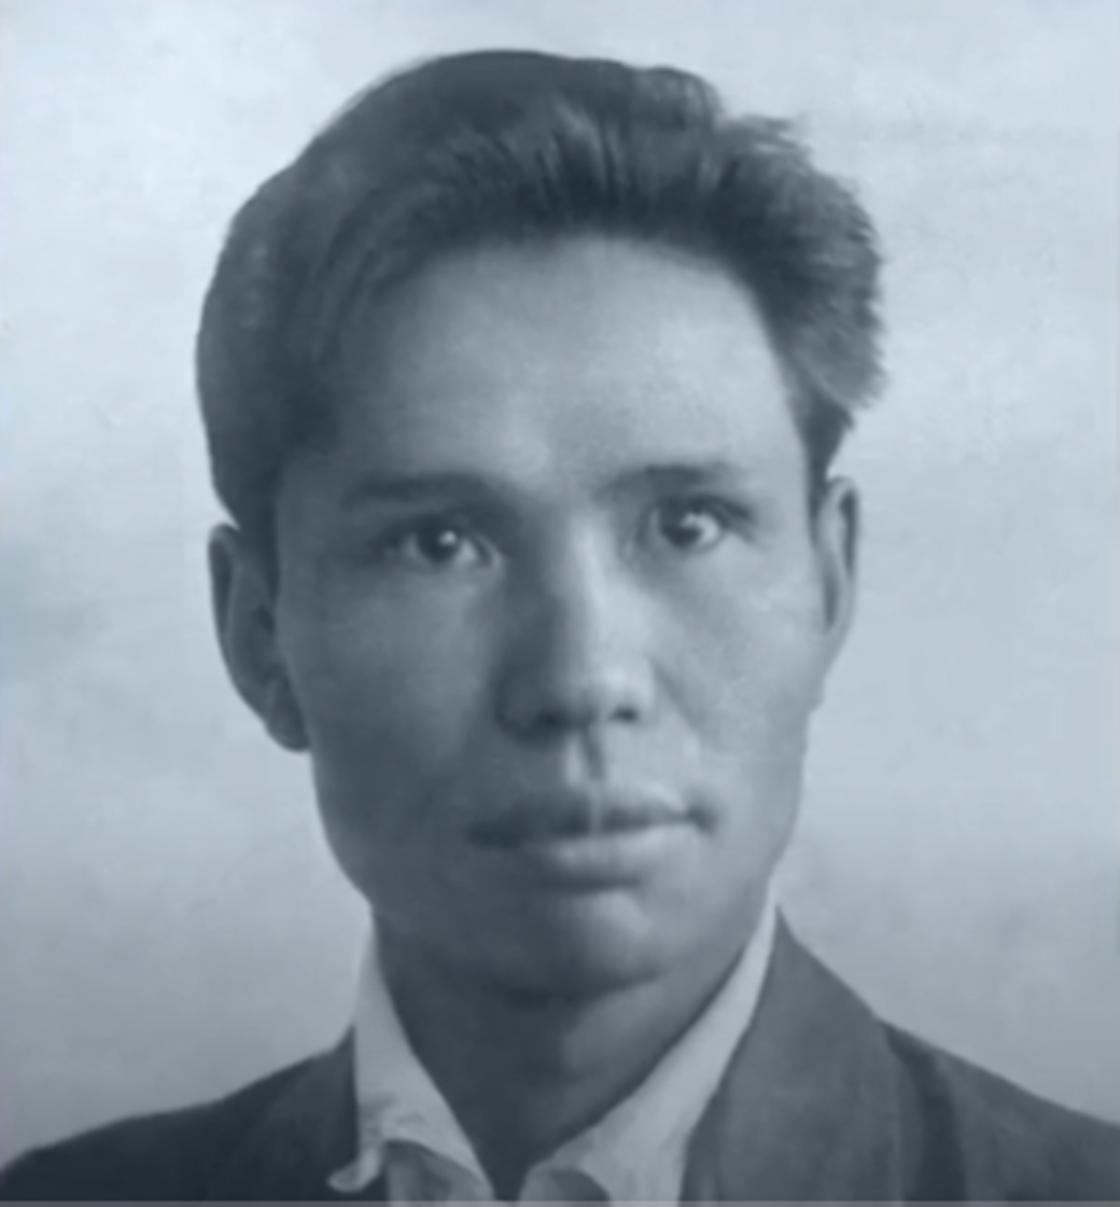 Ильяс Есенберлин: биография, творчество писателя